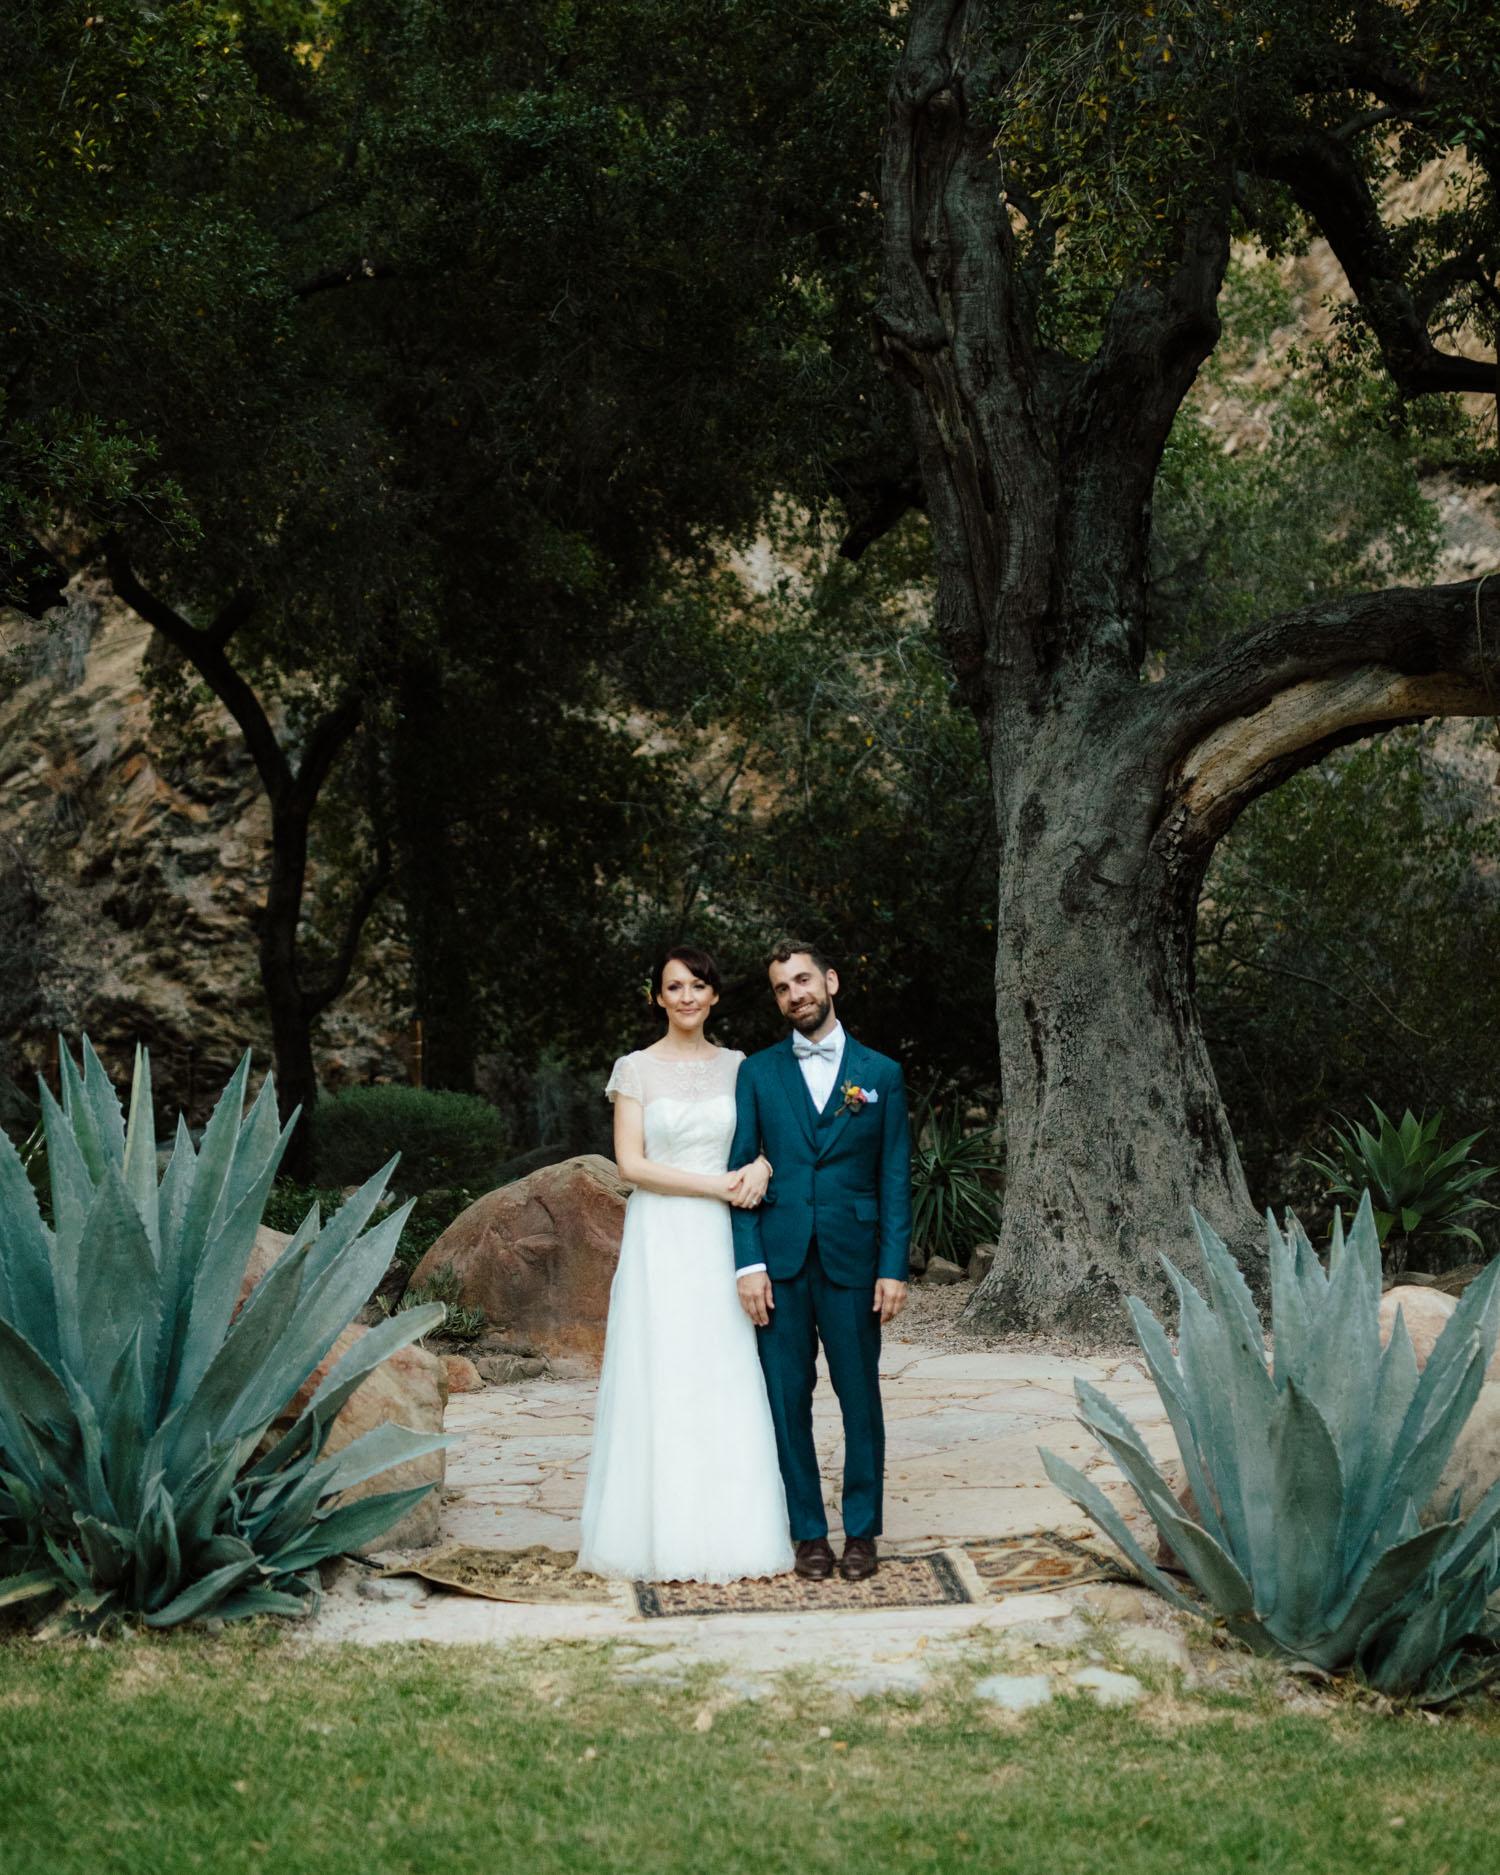 Ojai Wedding Photographer, Calliote Canyon Wedding - The Gathering Season x weareleoandkat 066.JPG